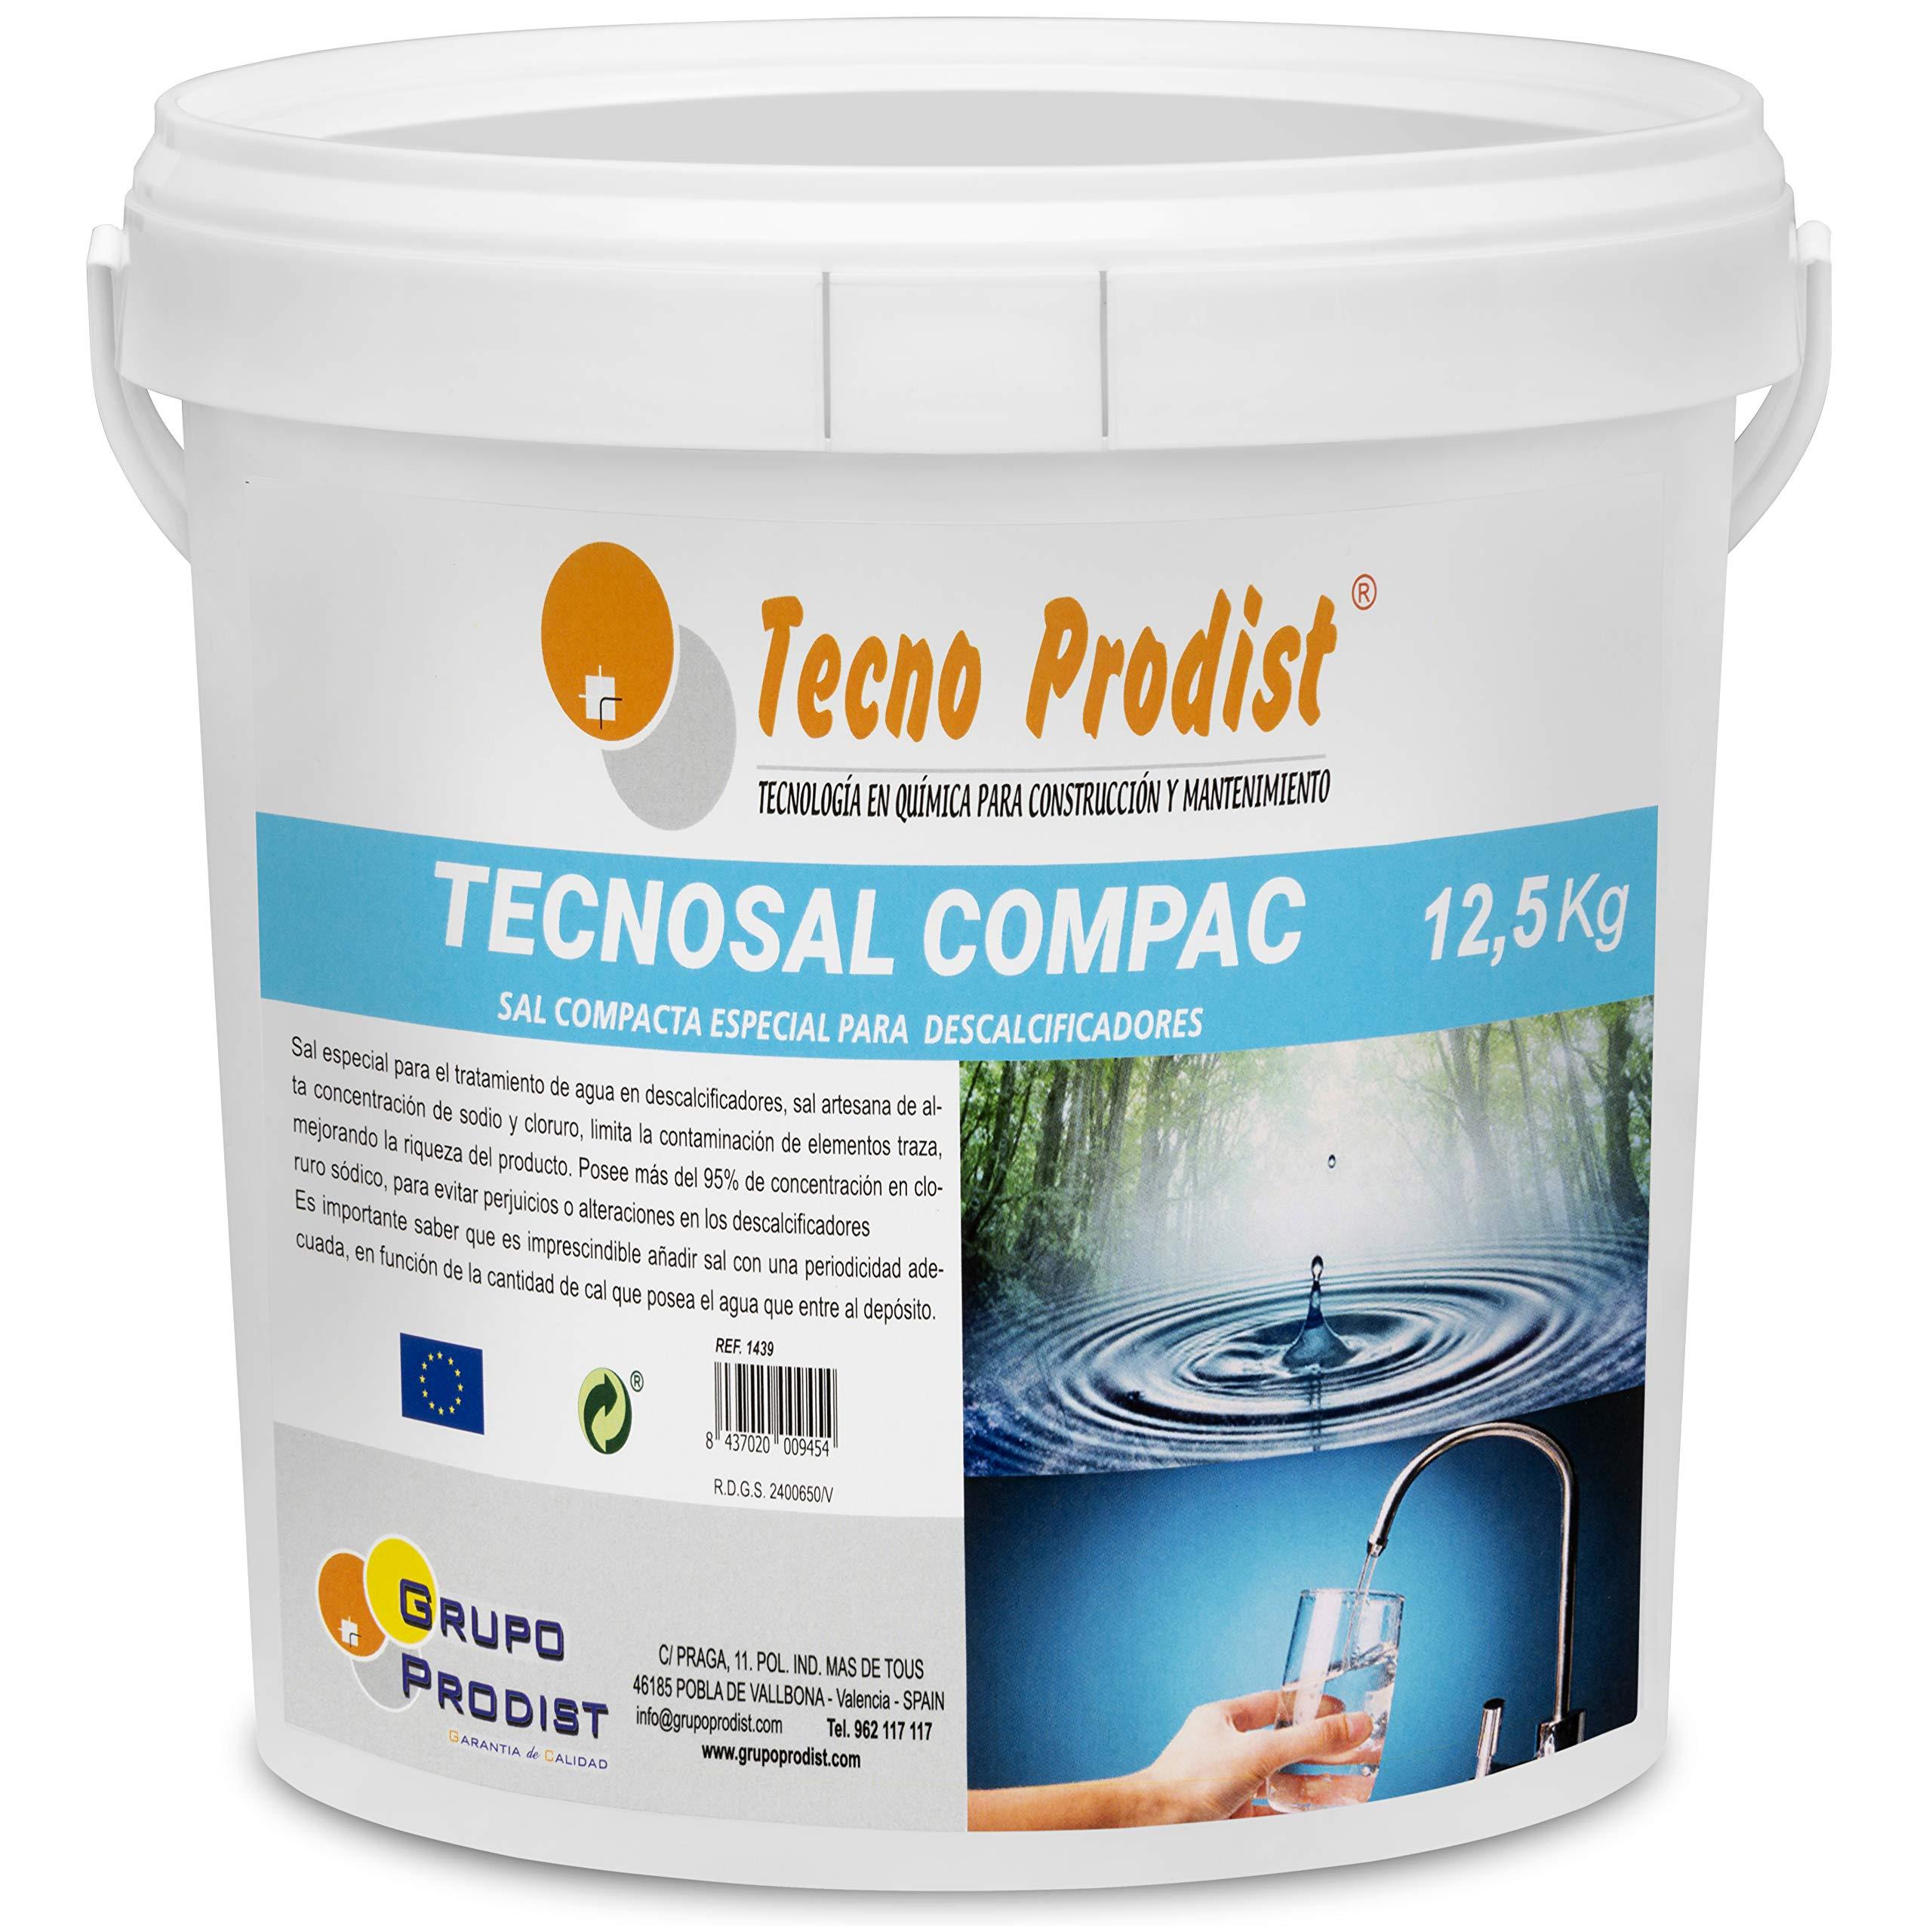 Tecno Prodist TECNOSAL - Sal compacta Especial para descalcificadores - En Cubo de 12,5 kg Fácil Aplicación: Amazon.es: Hogar